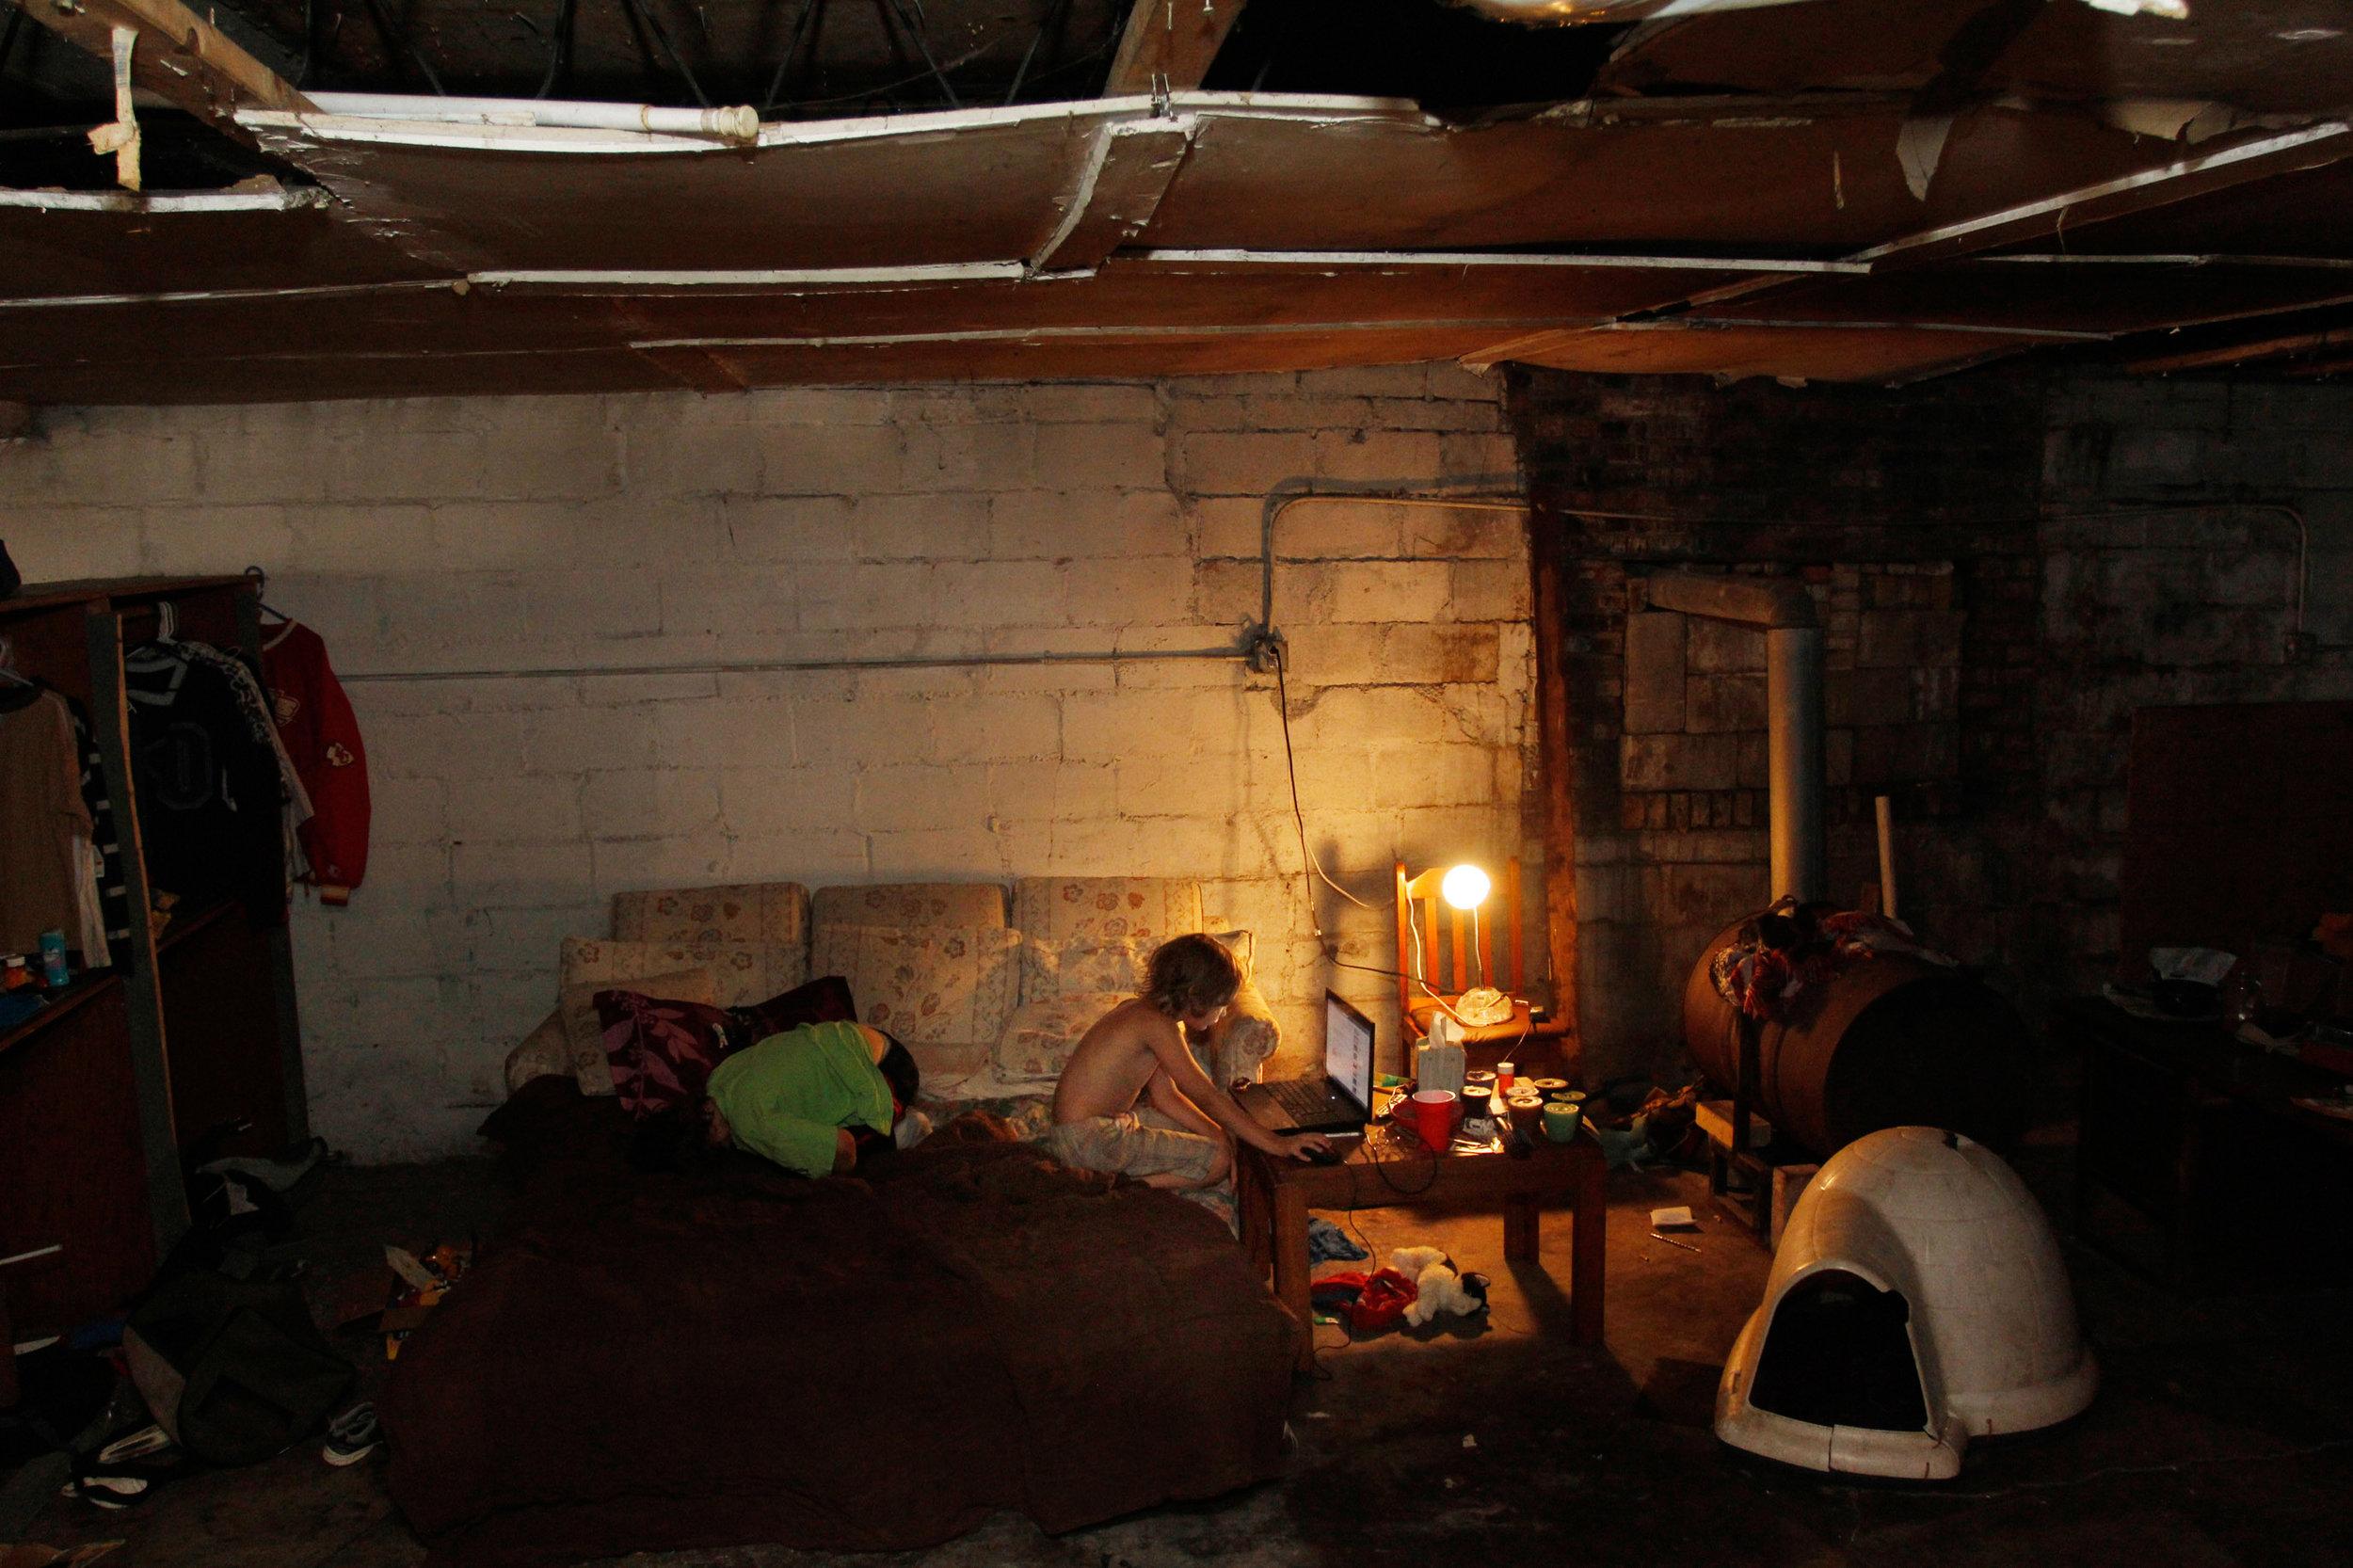 009_20120625_child_poverty.jpg